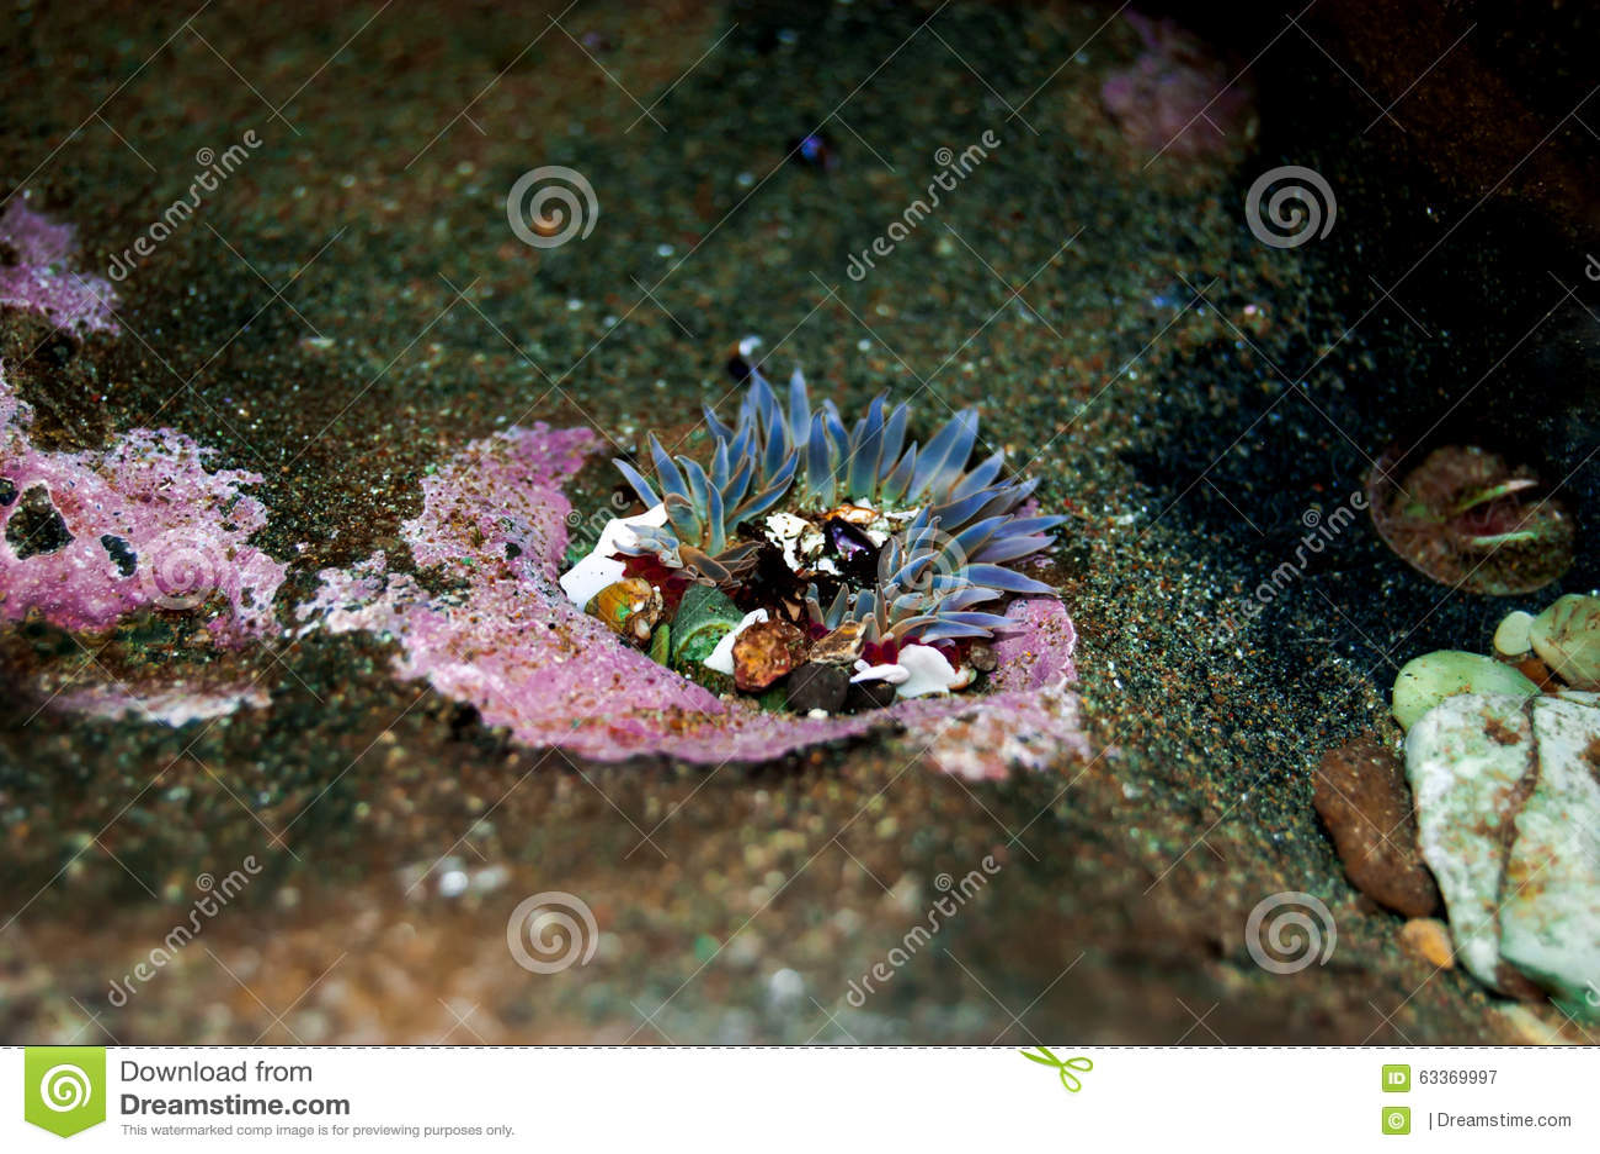 the clone specific segregation of sea anemone Title: clone specific segregation in the sea anemone anthopleura elegantissima created date: 20160809131922z.